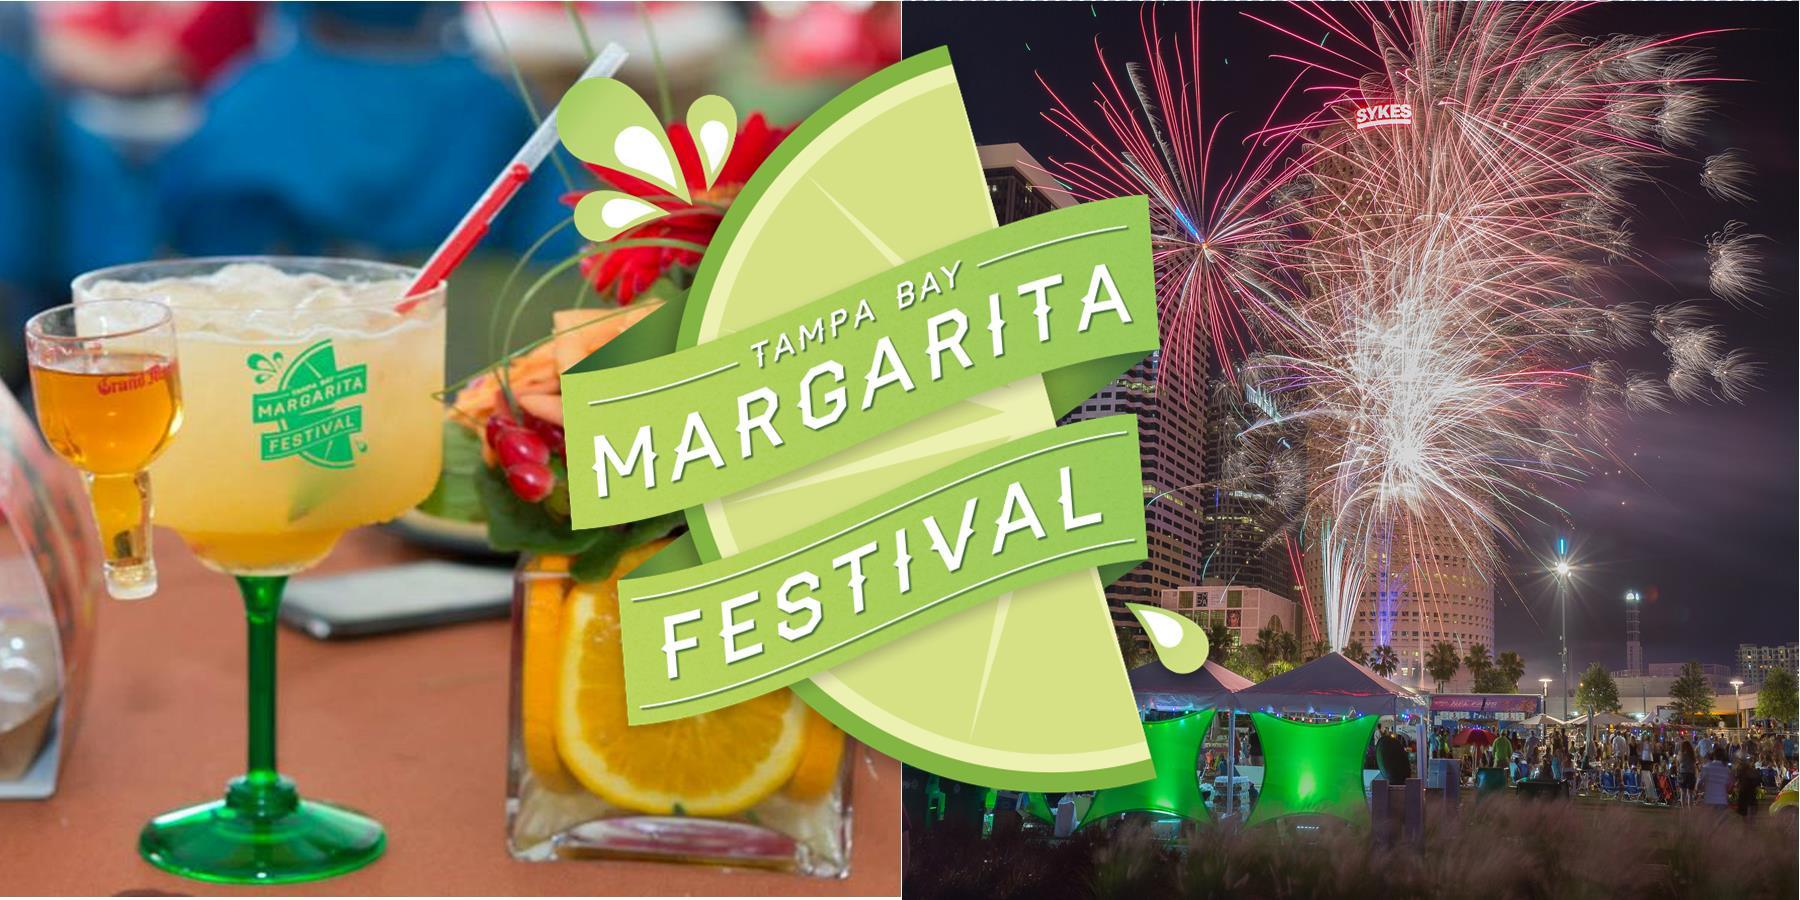 Margarita Festival 2020 Tampa Bay Margarita Festival